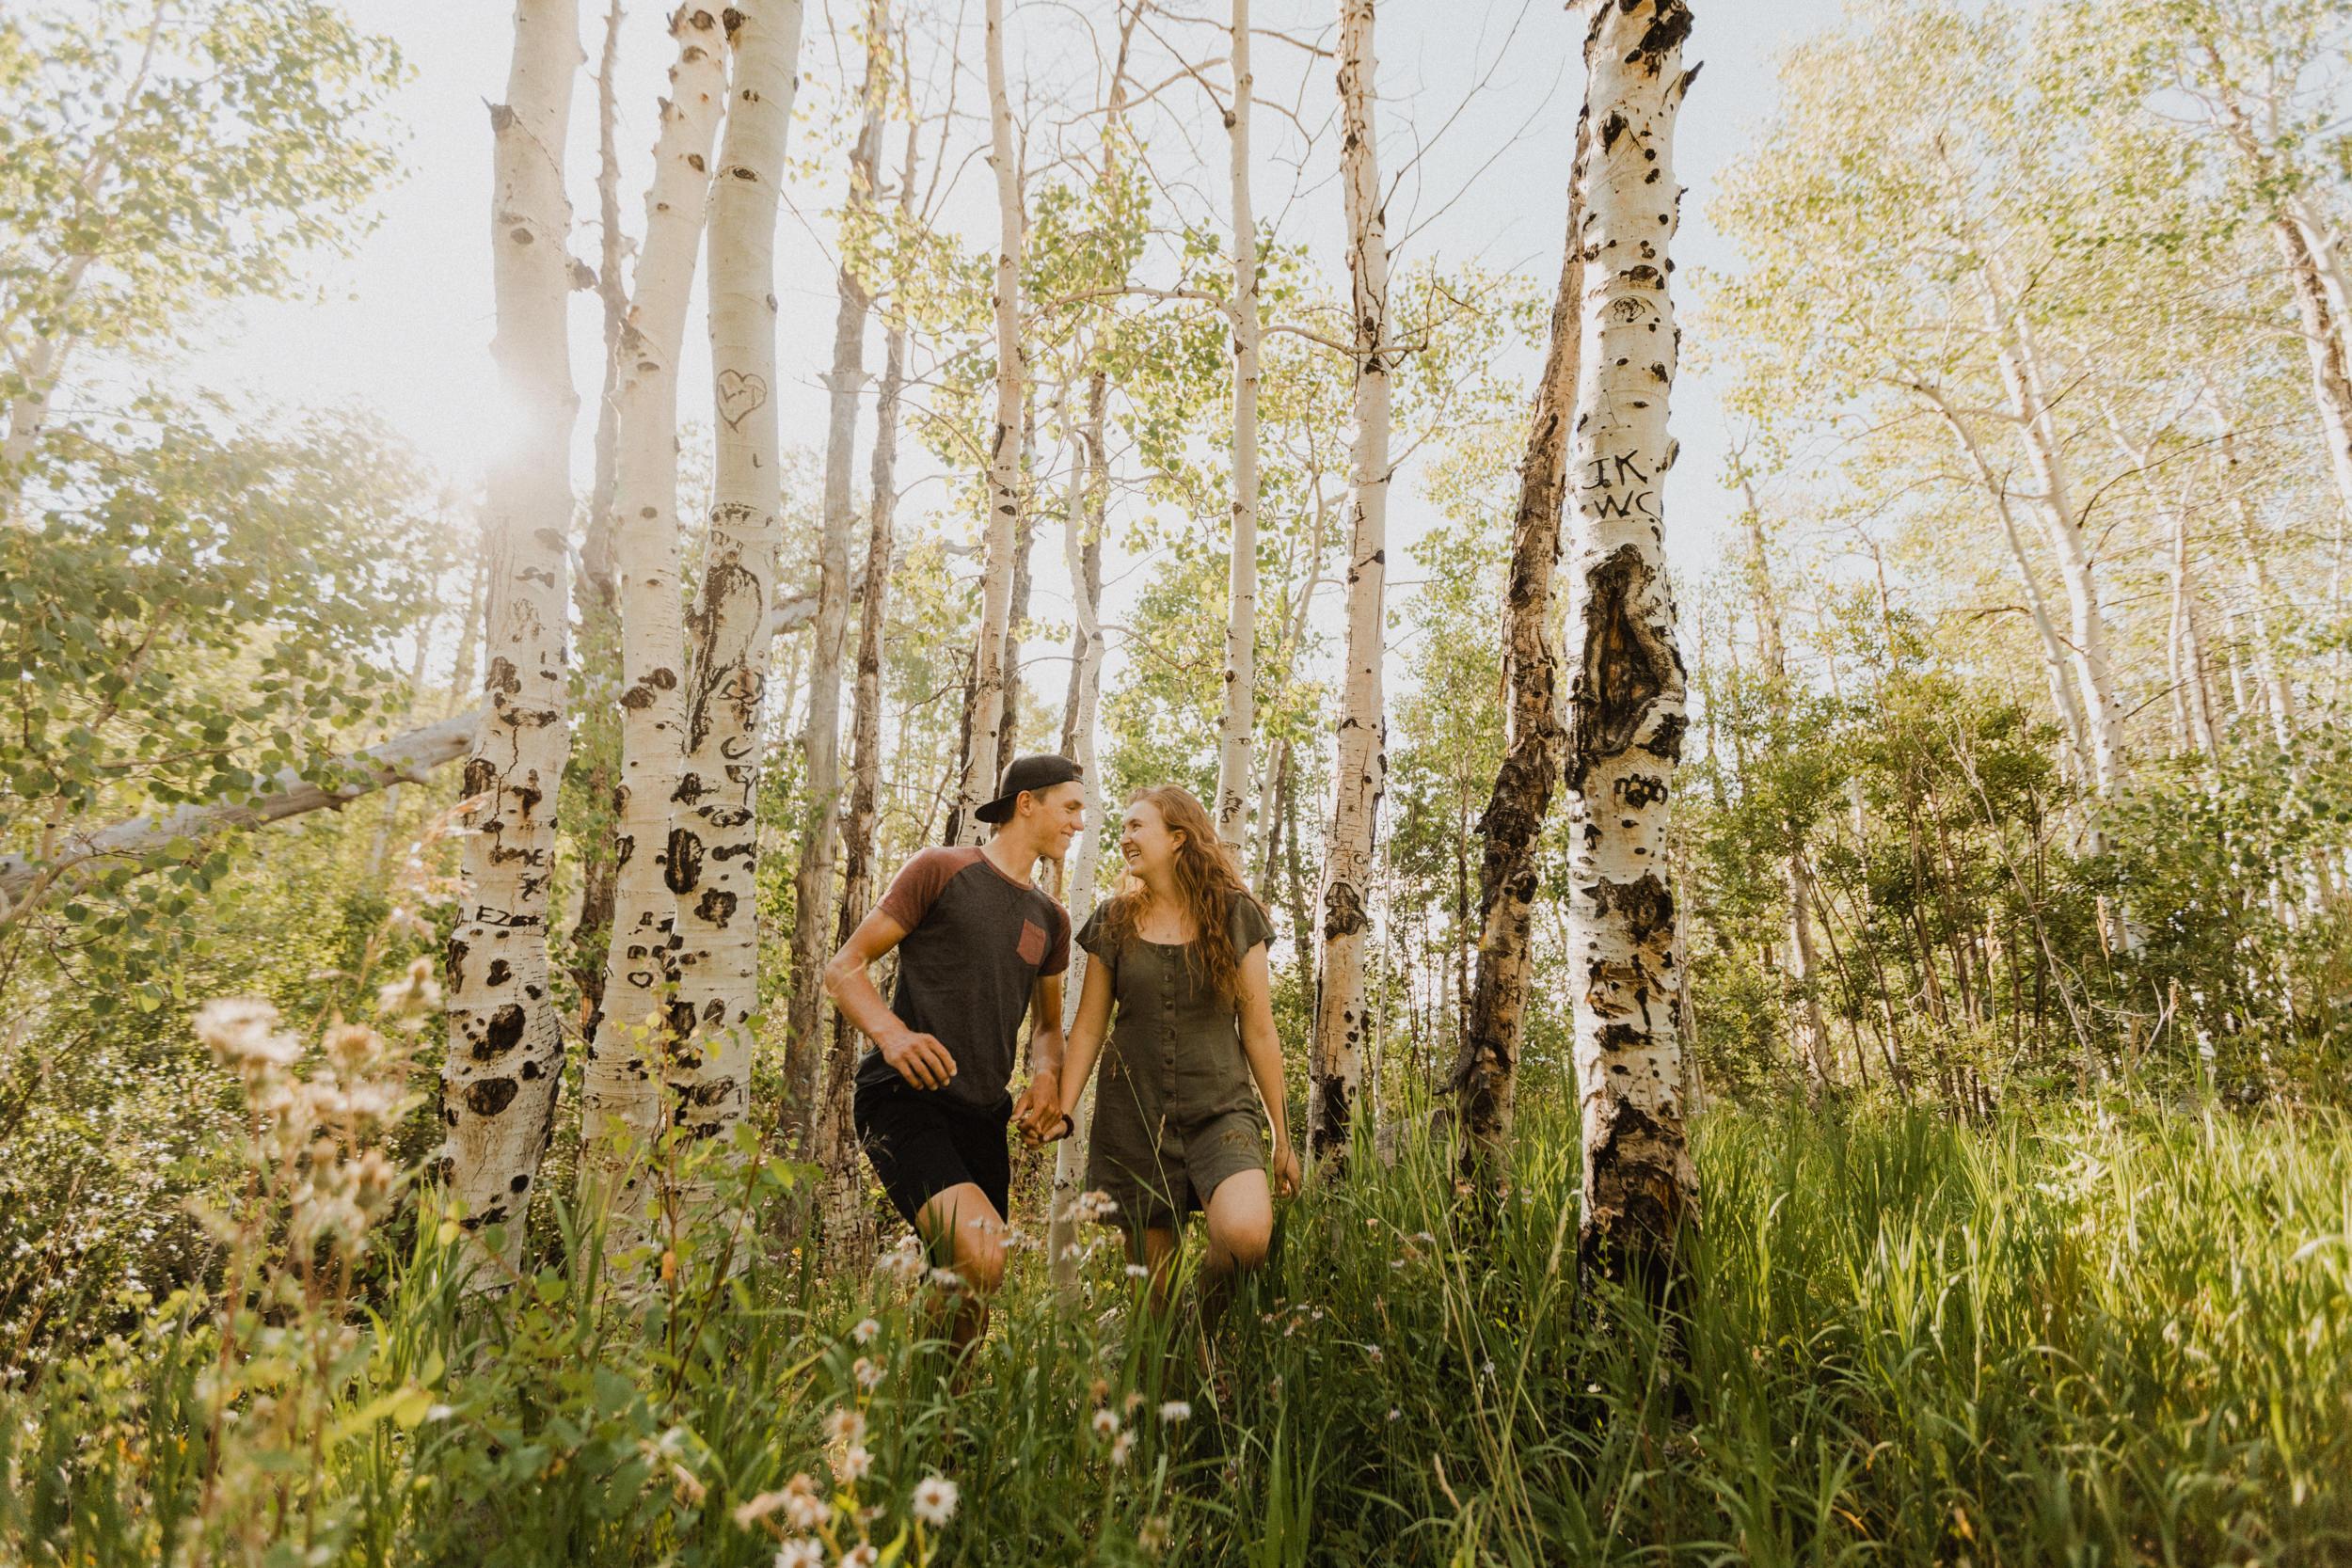 Aspen Grove Couple Photoshoot on the Grand Mesa